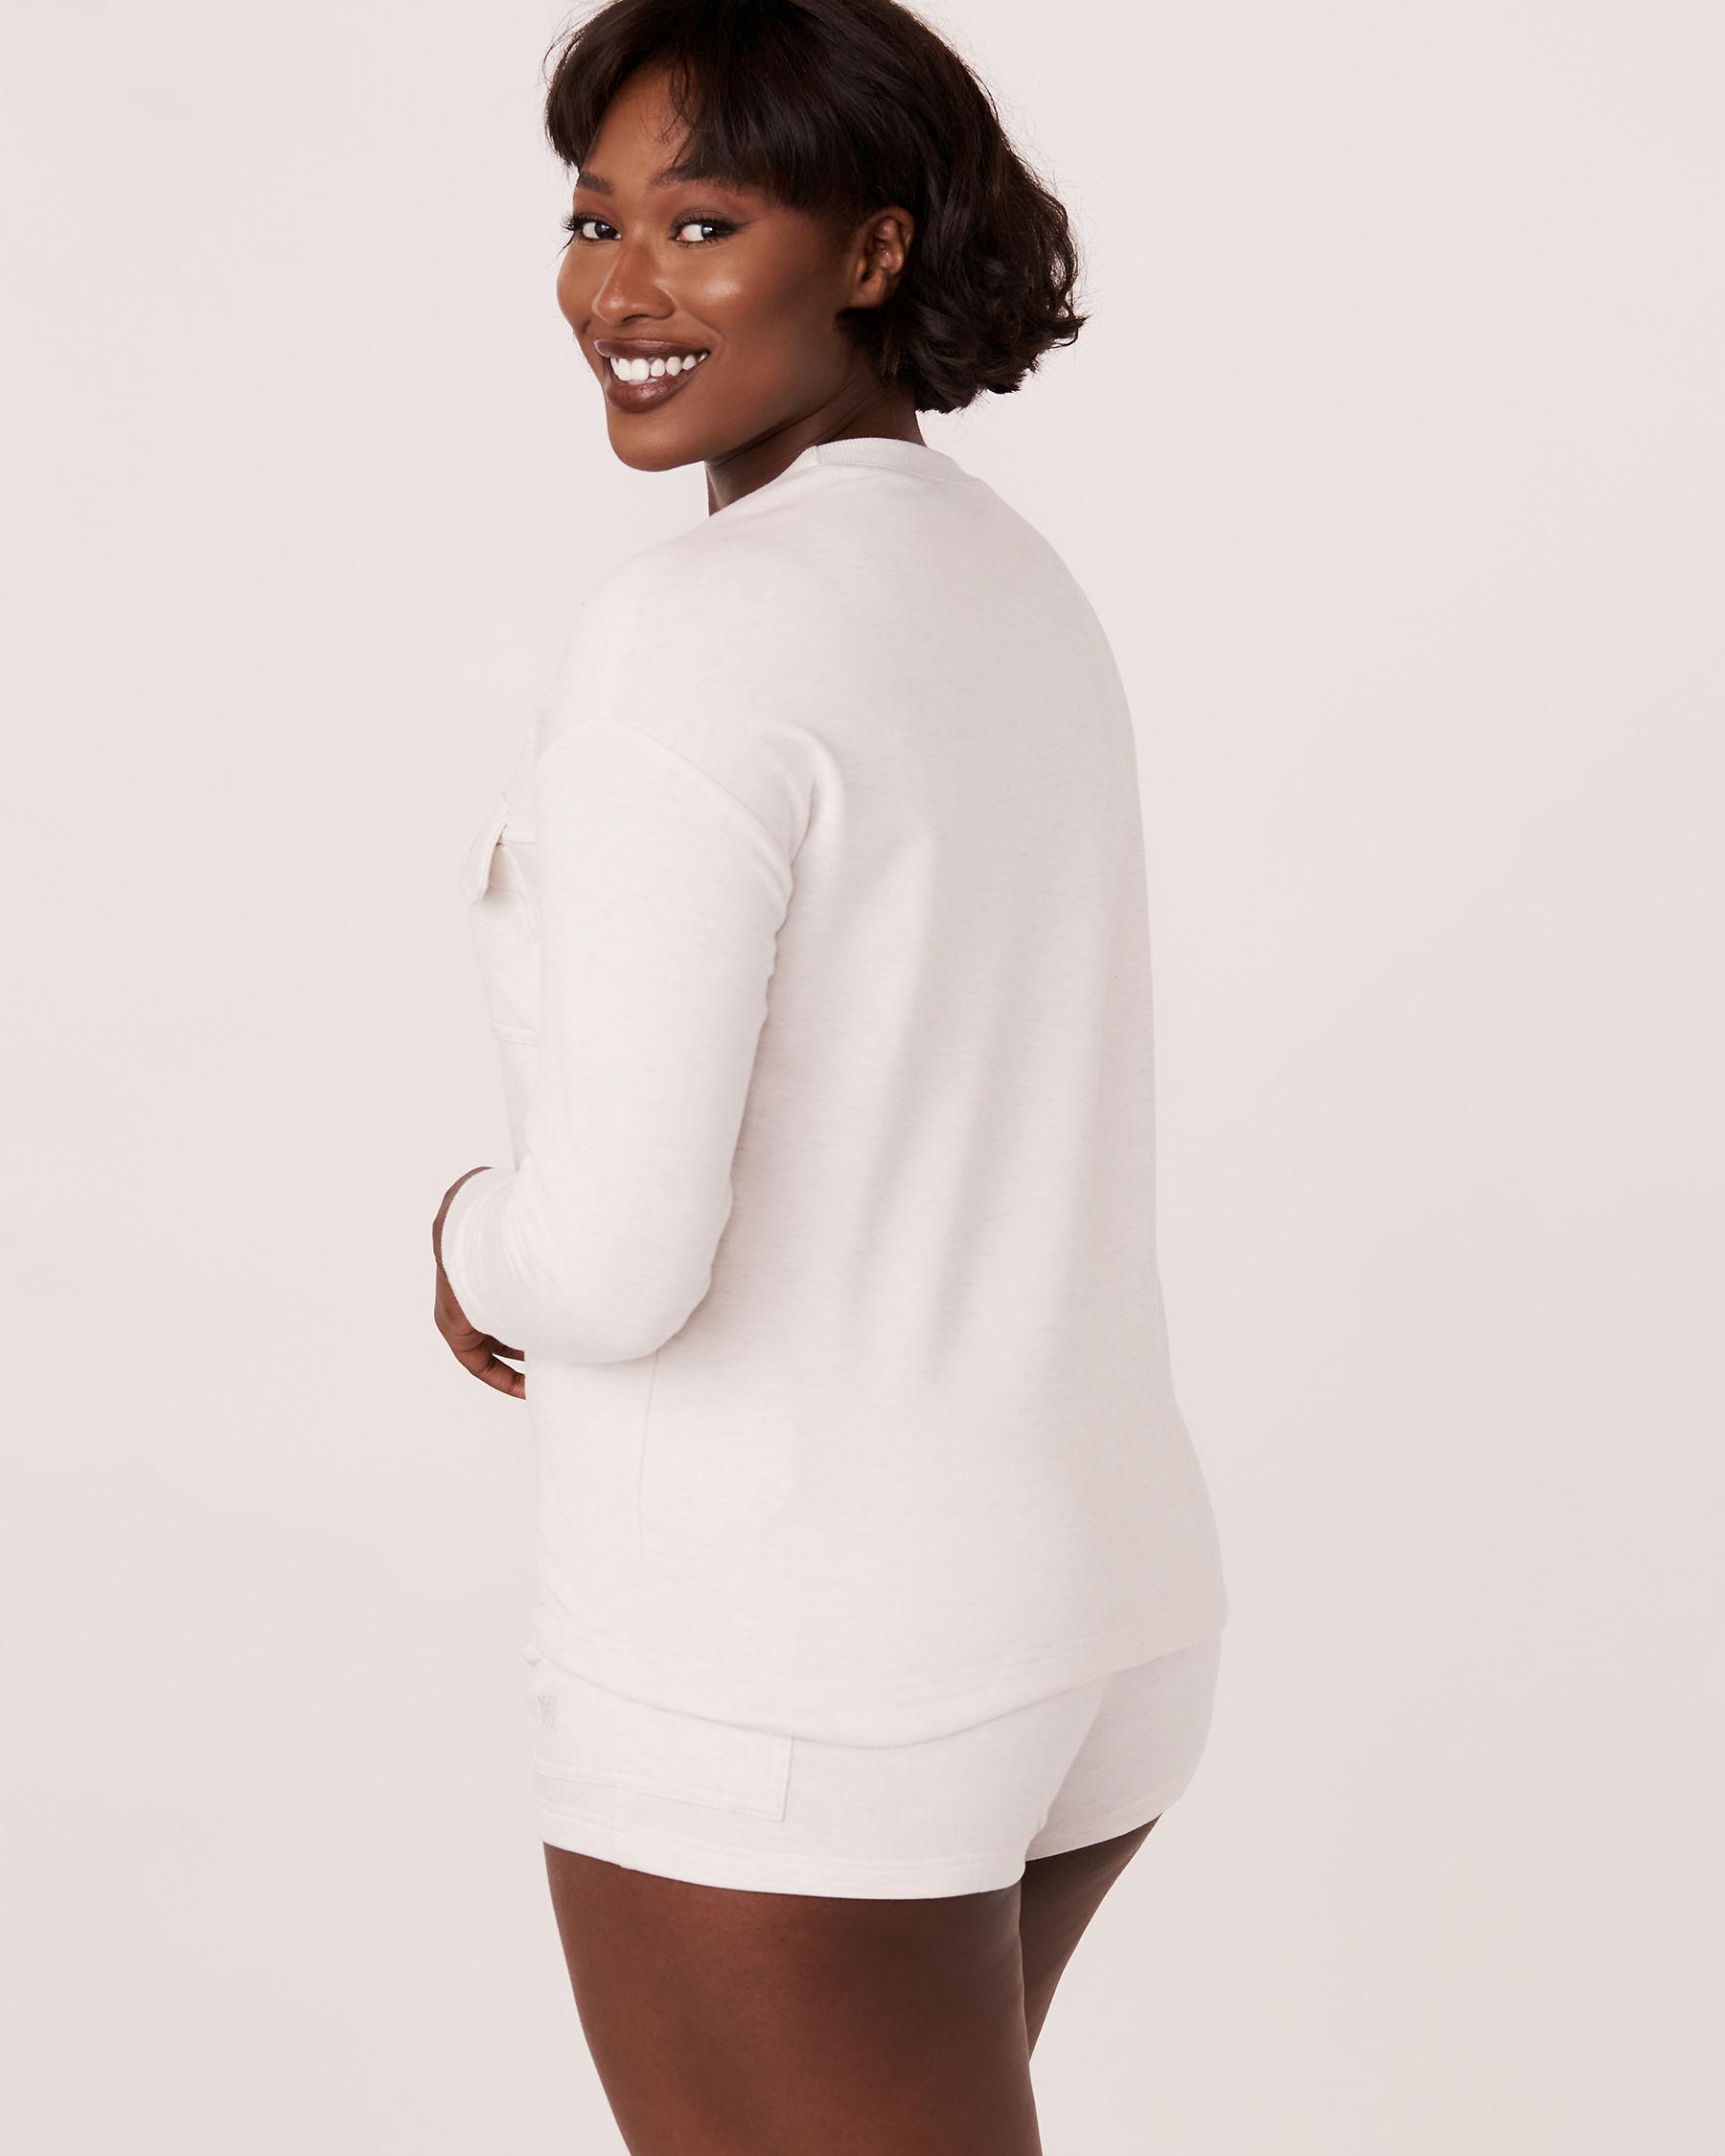 LA VIE EN ROSE Patch Pocket Long Sleeve Shirt Soft grey 50100004 - View2